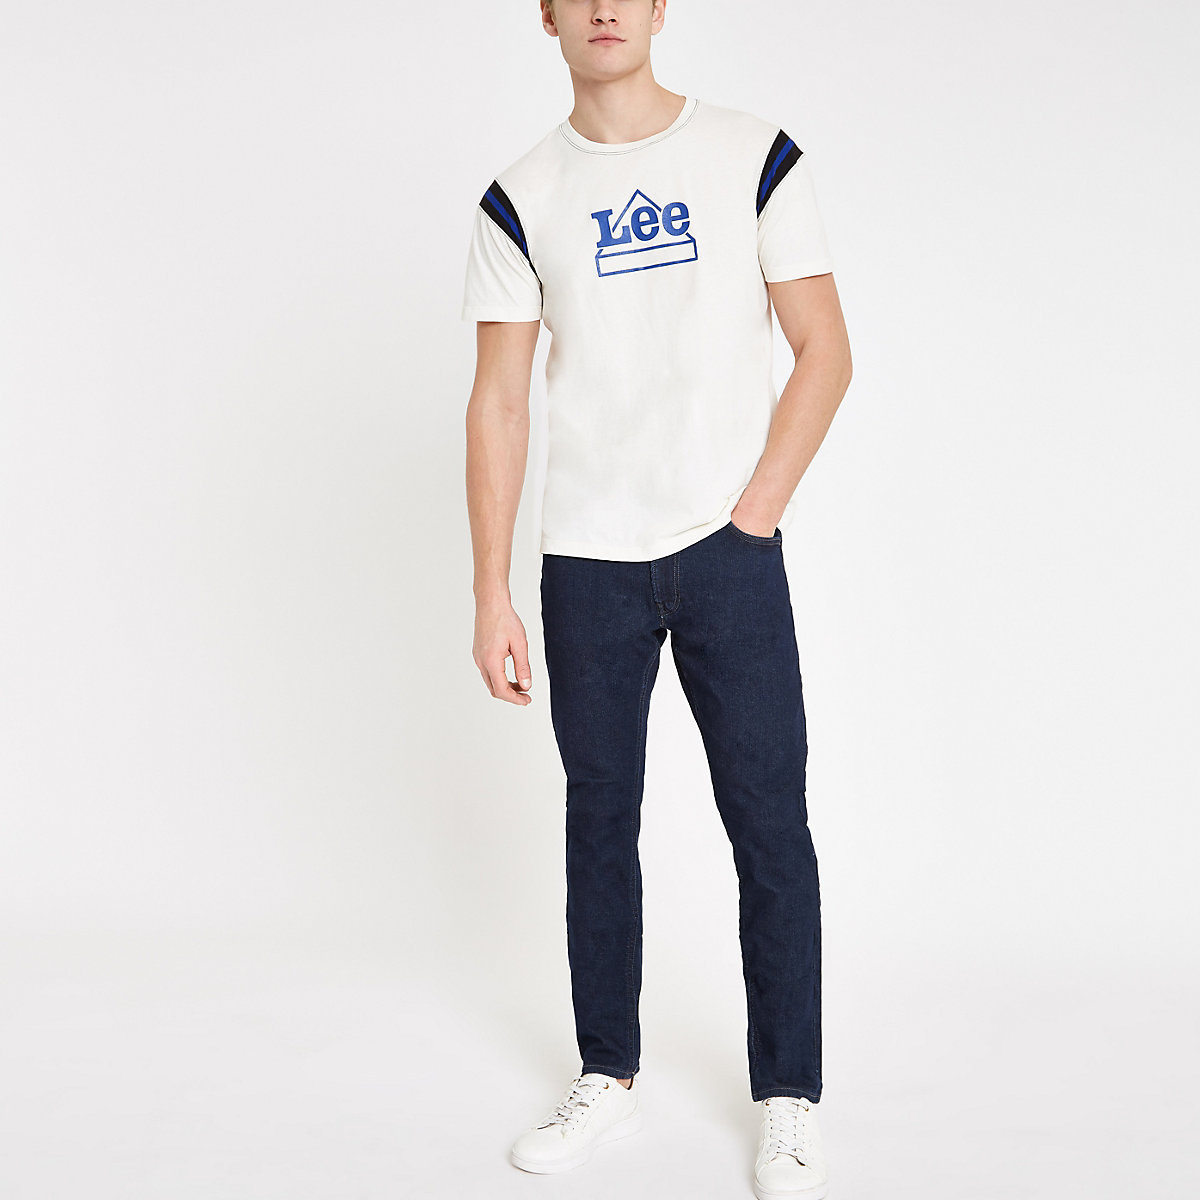 Lee blue tapered slim fit jeans